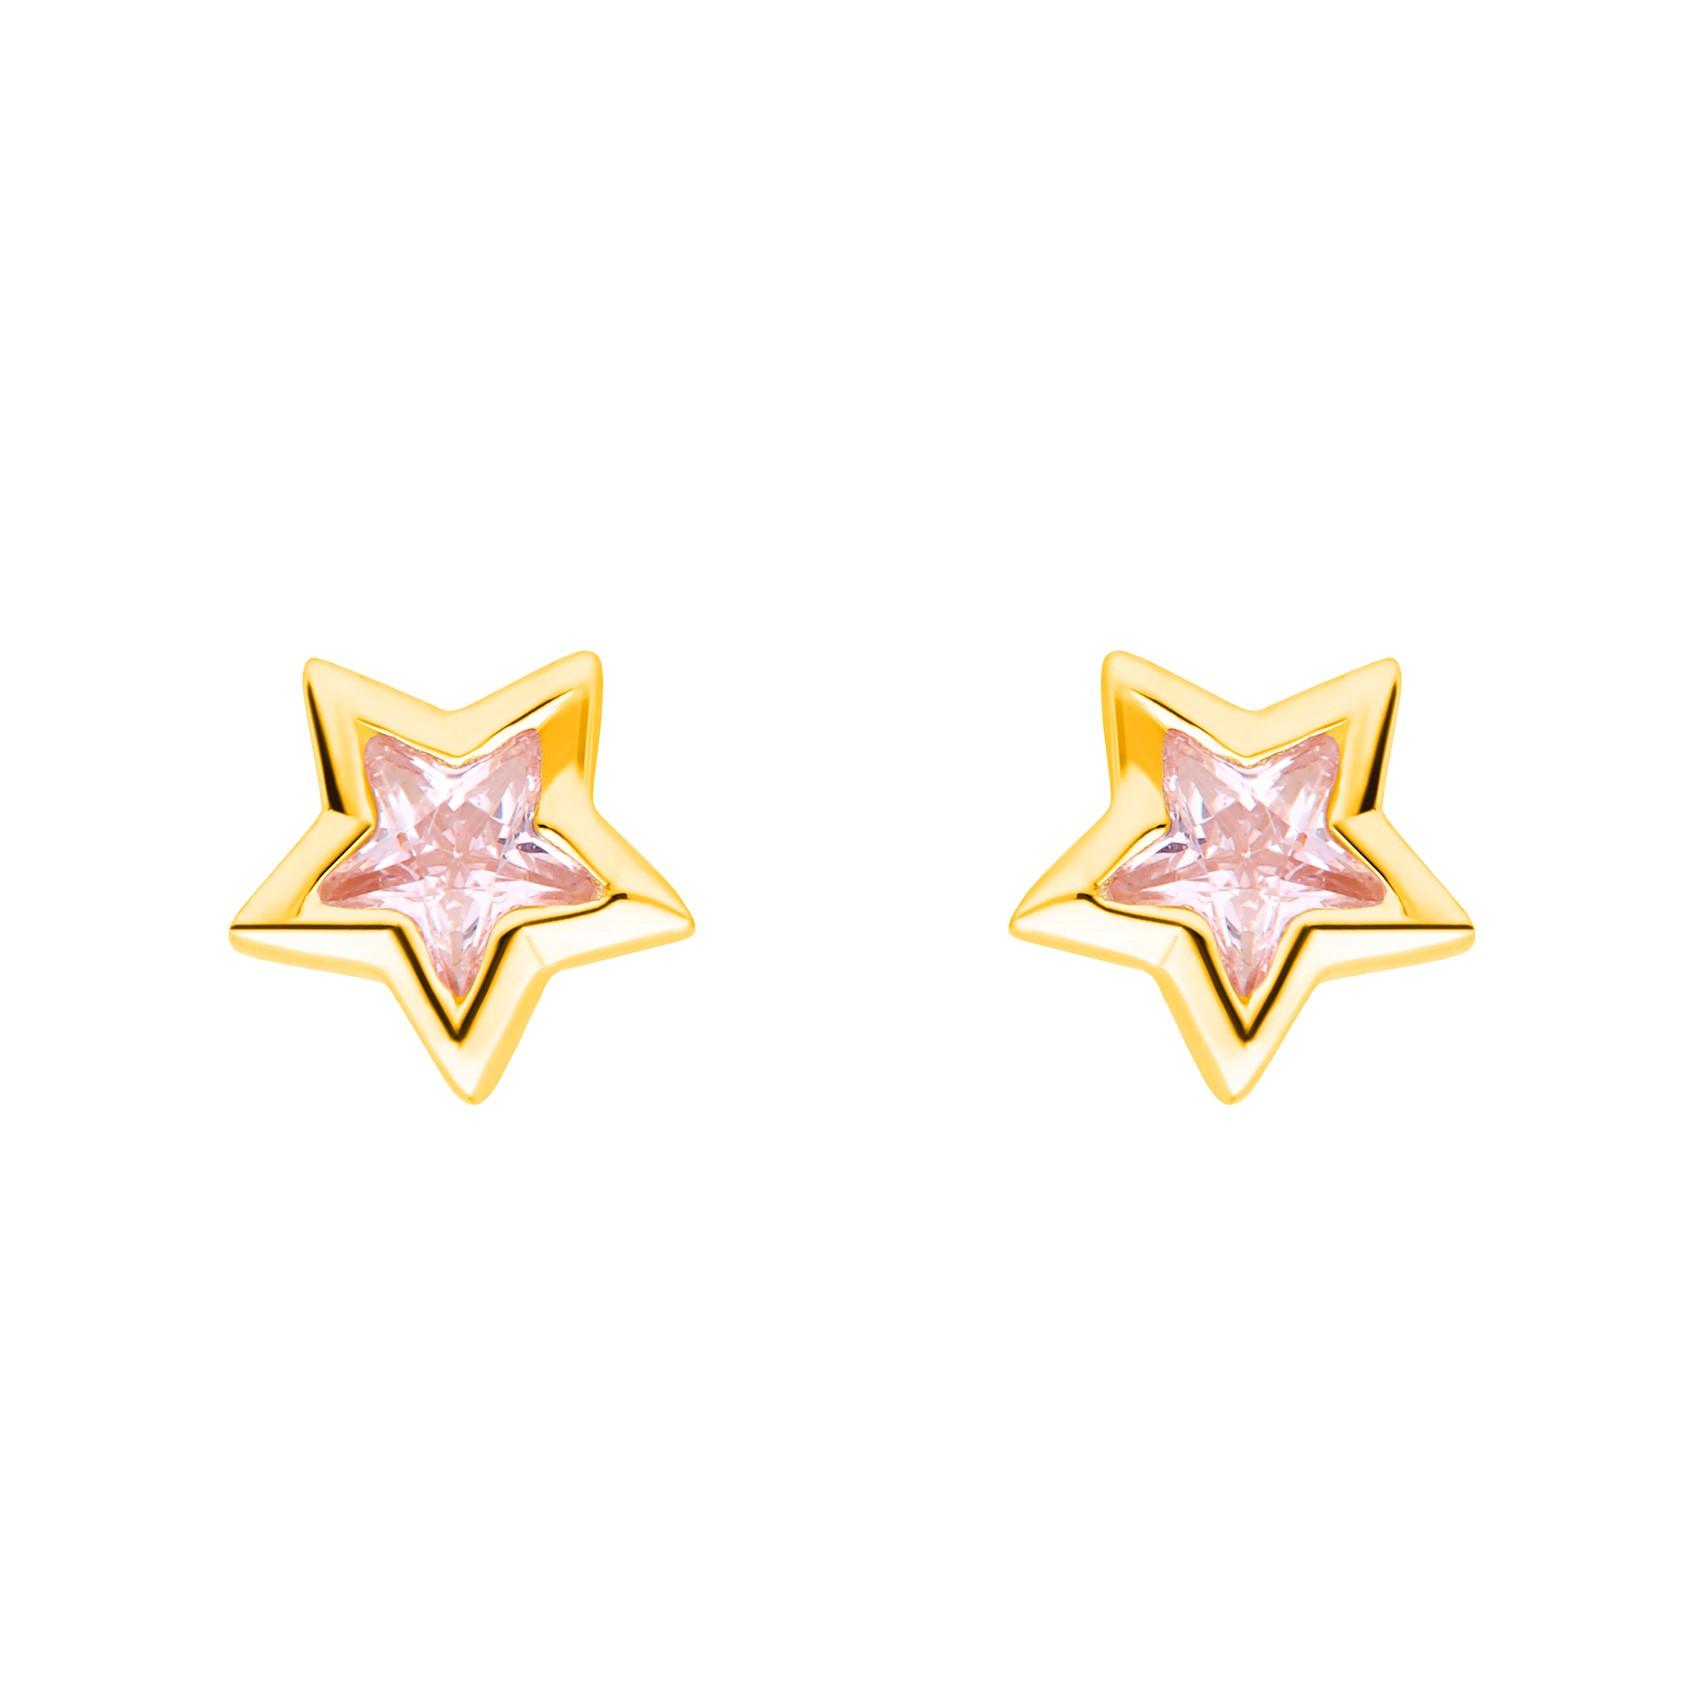 Ohrschmuck Stern Prinzessin Lillifee (Marke Amor)